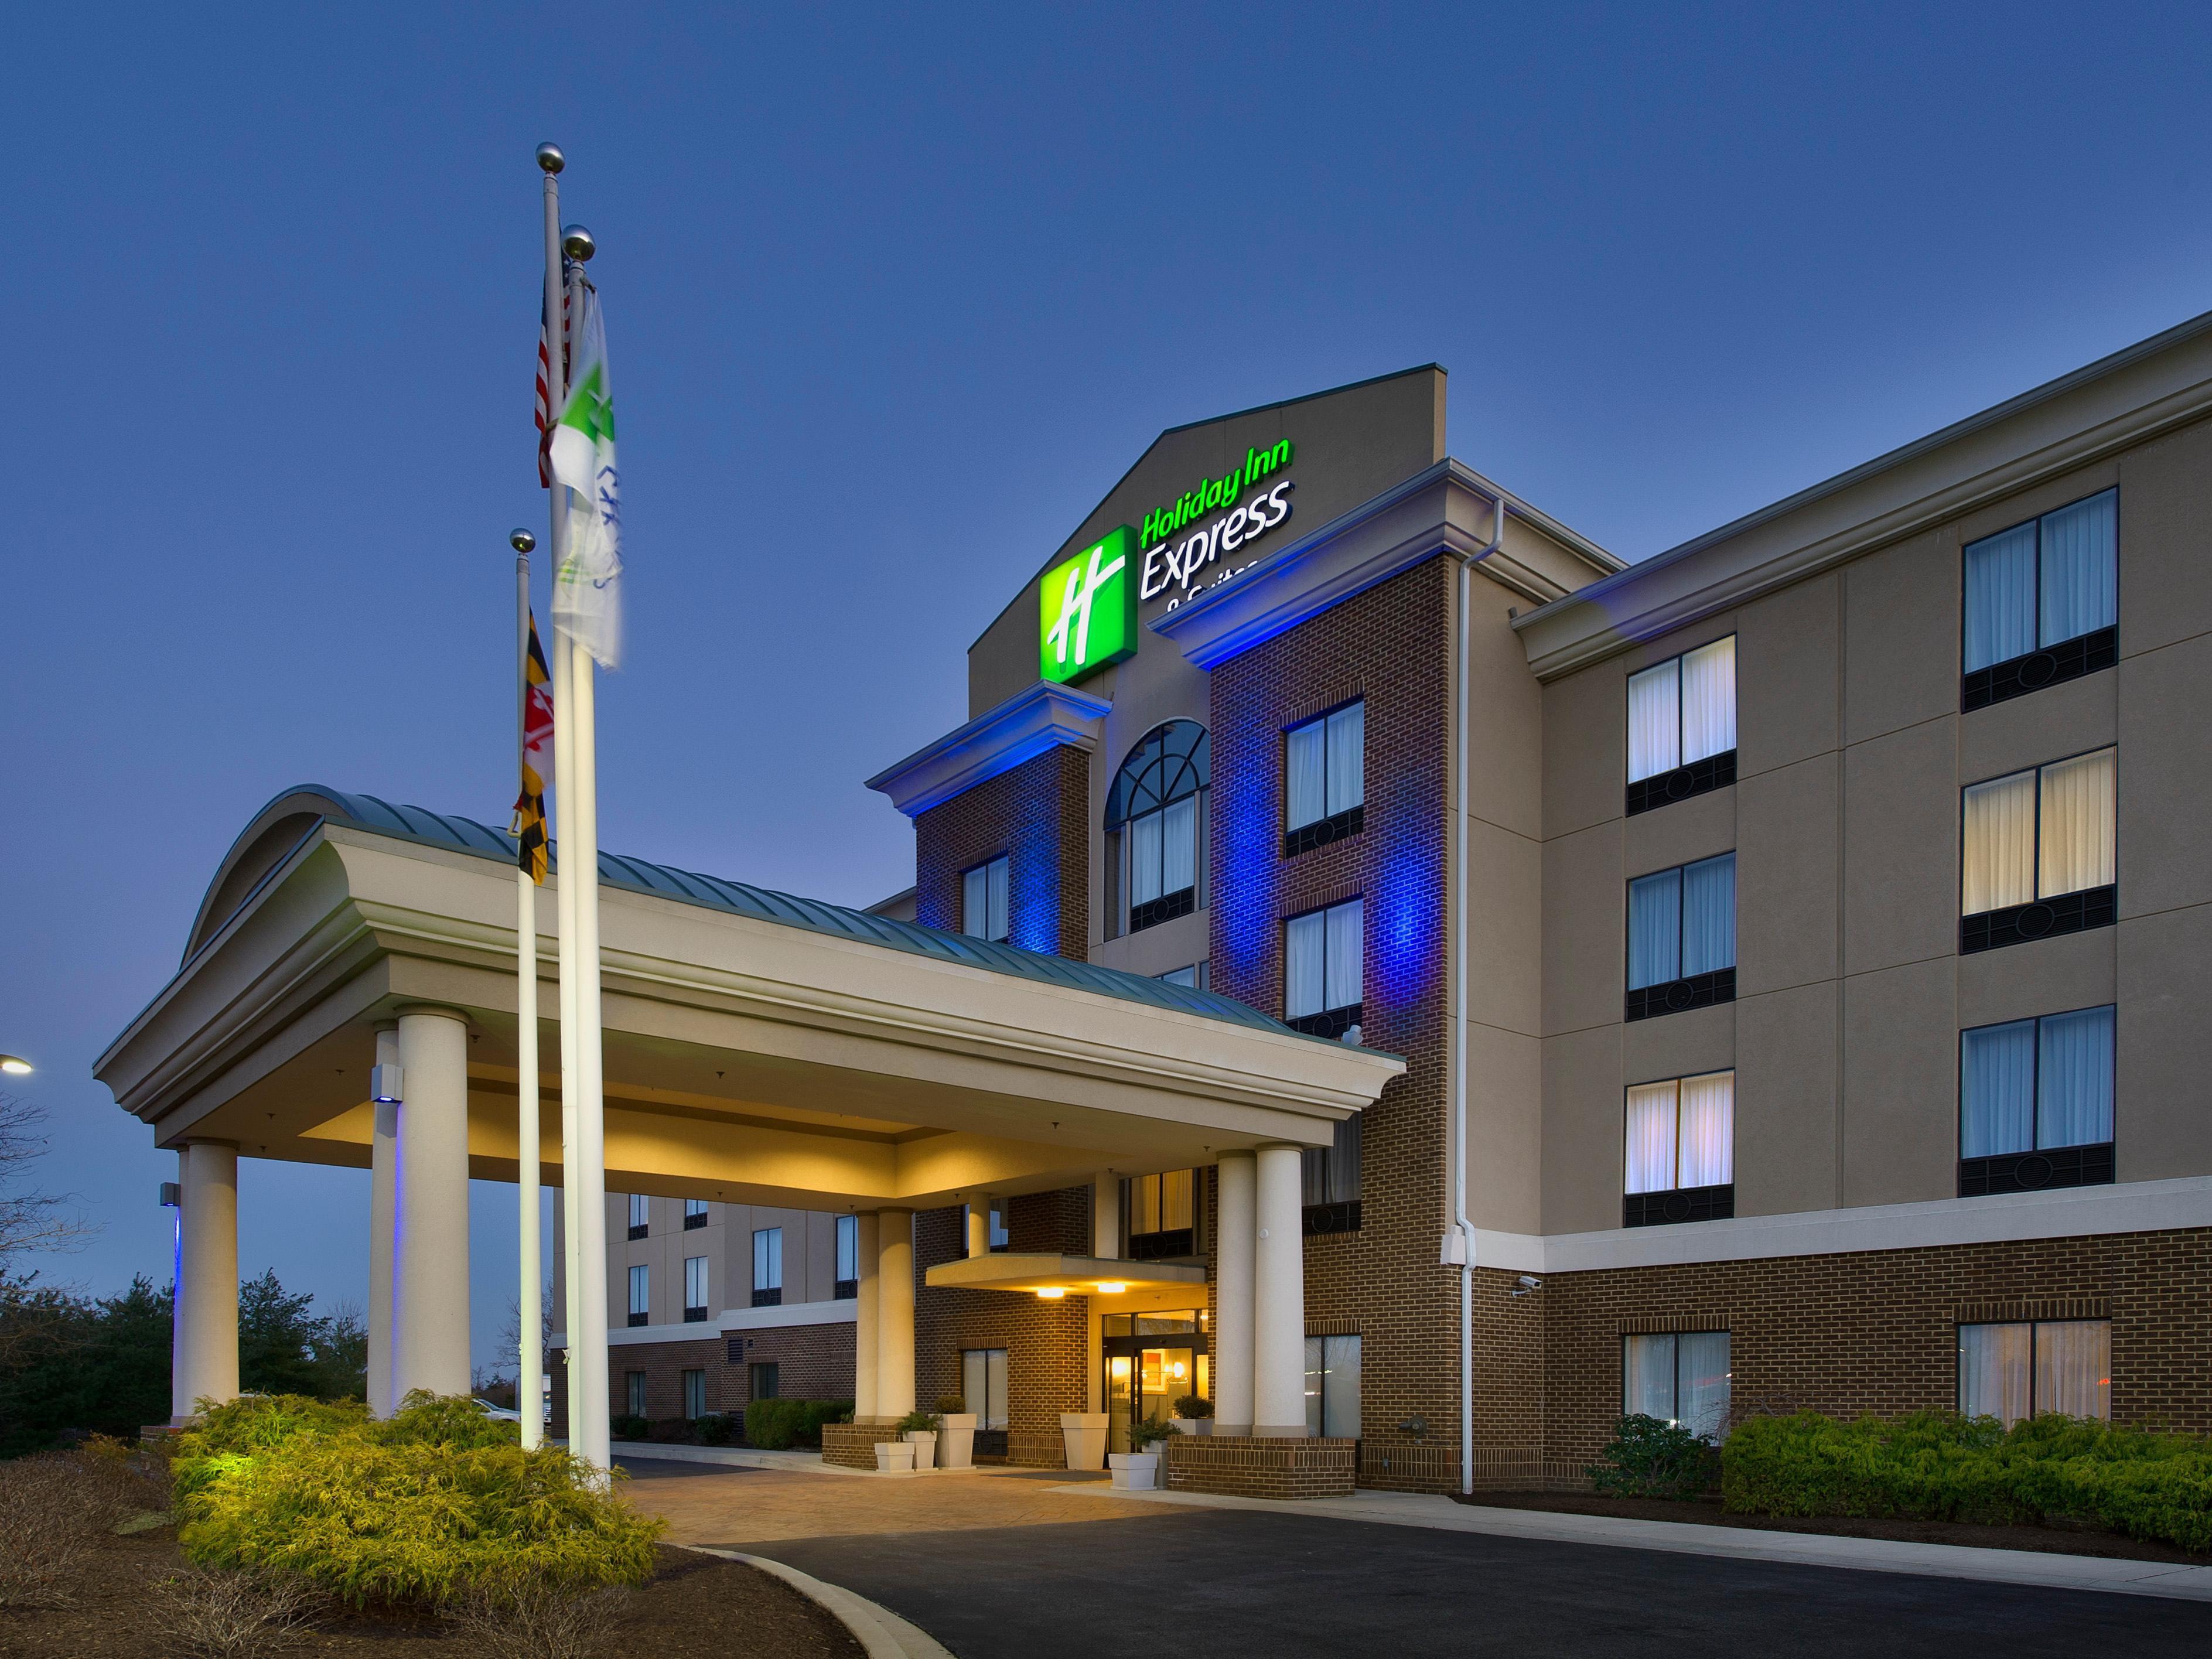 Holiday Inn Express & Suites Columbia East - Elkridge Hotel by IHG